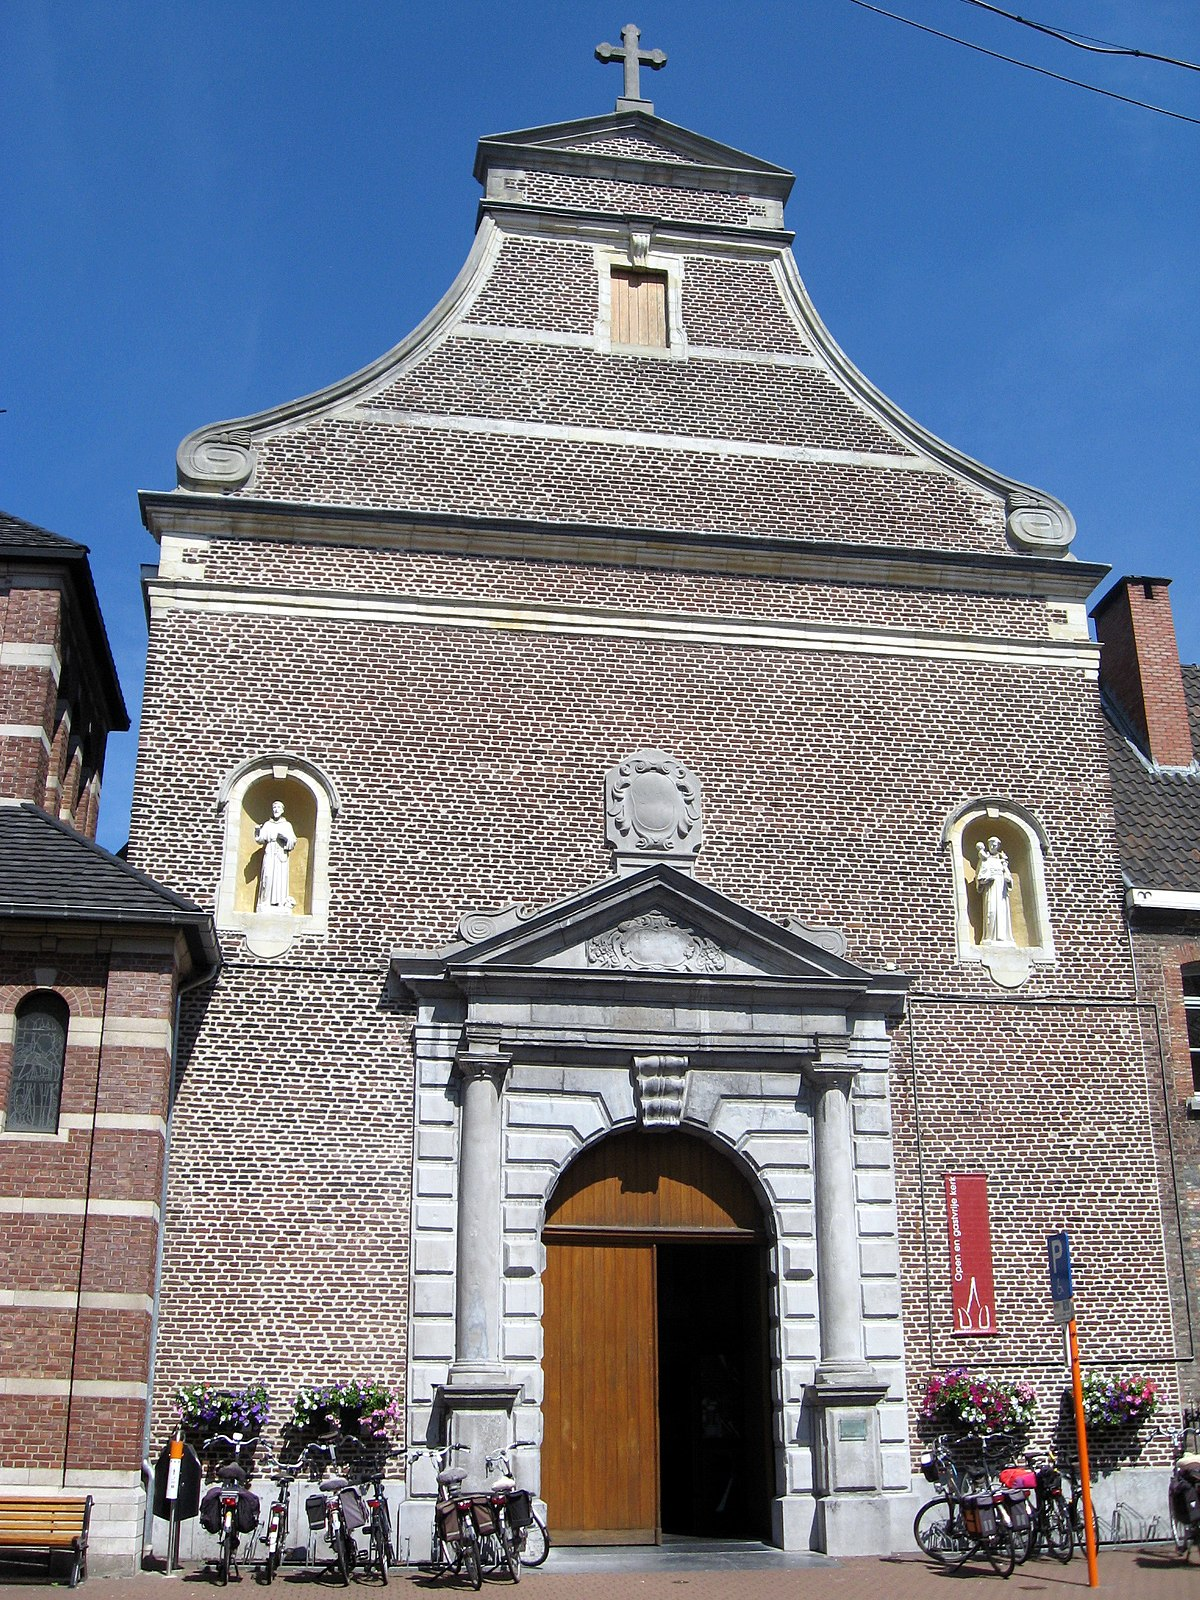 Sint rochuskerk hasselt wikipedia for Interieur hasselt